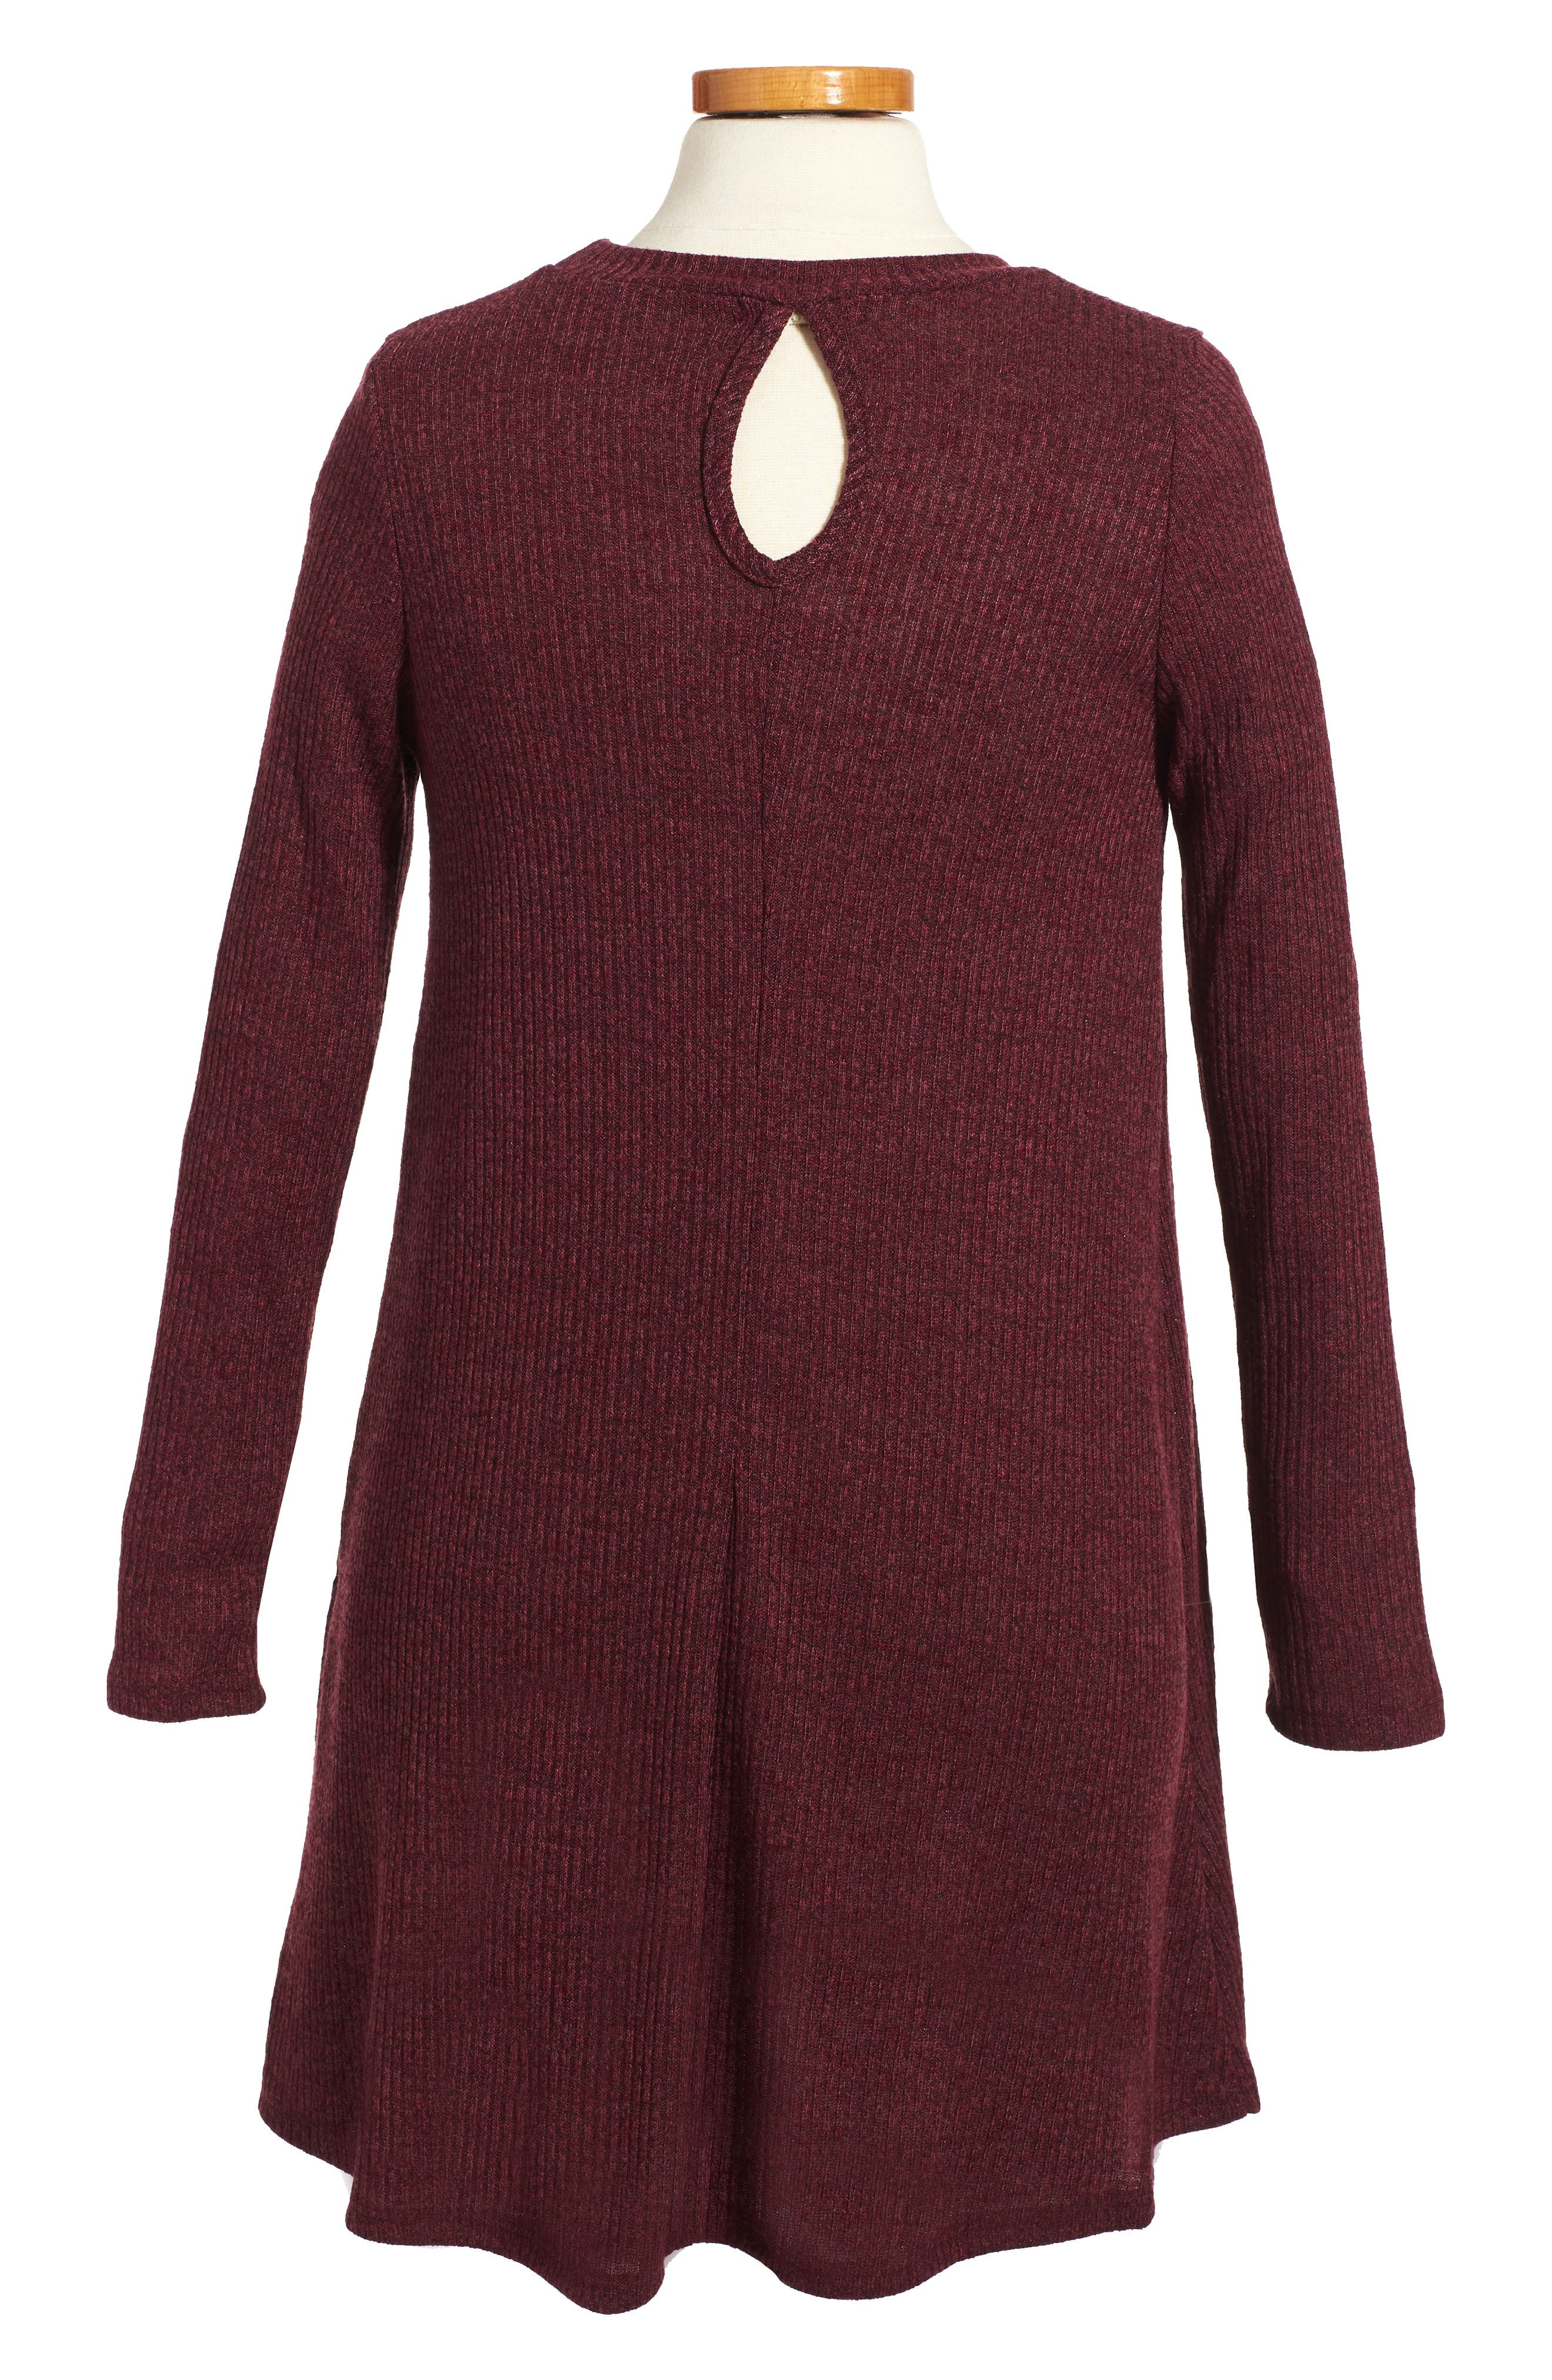 Alternate Image 2  - Soprano Rib Knit Sweater Dress (Big Girls)